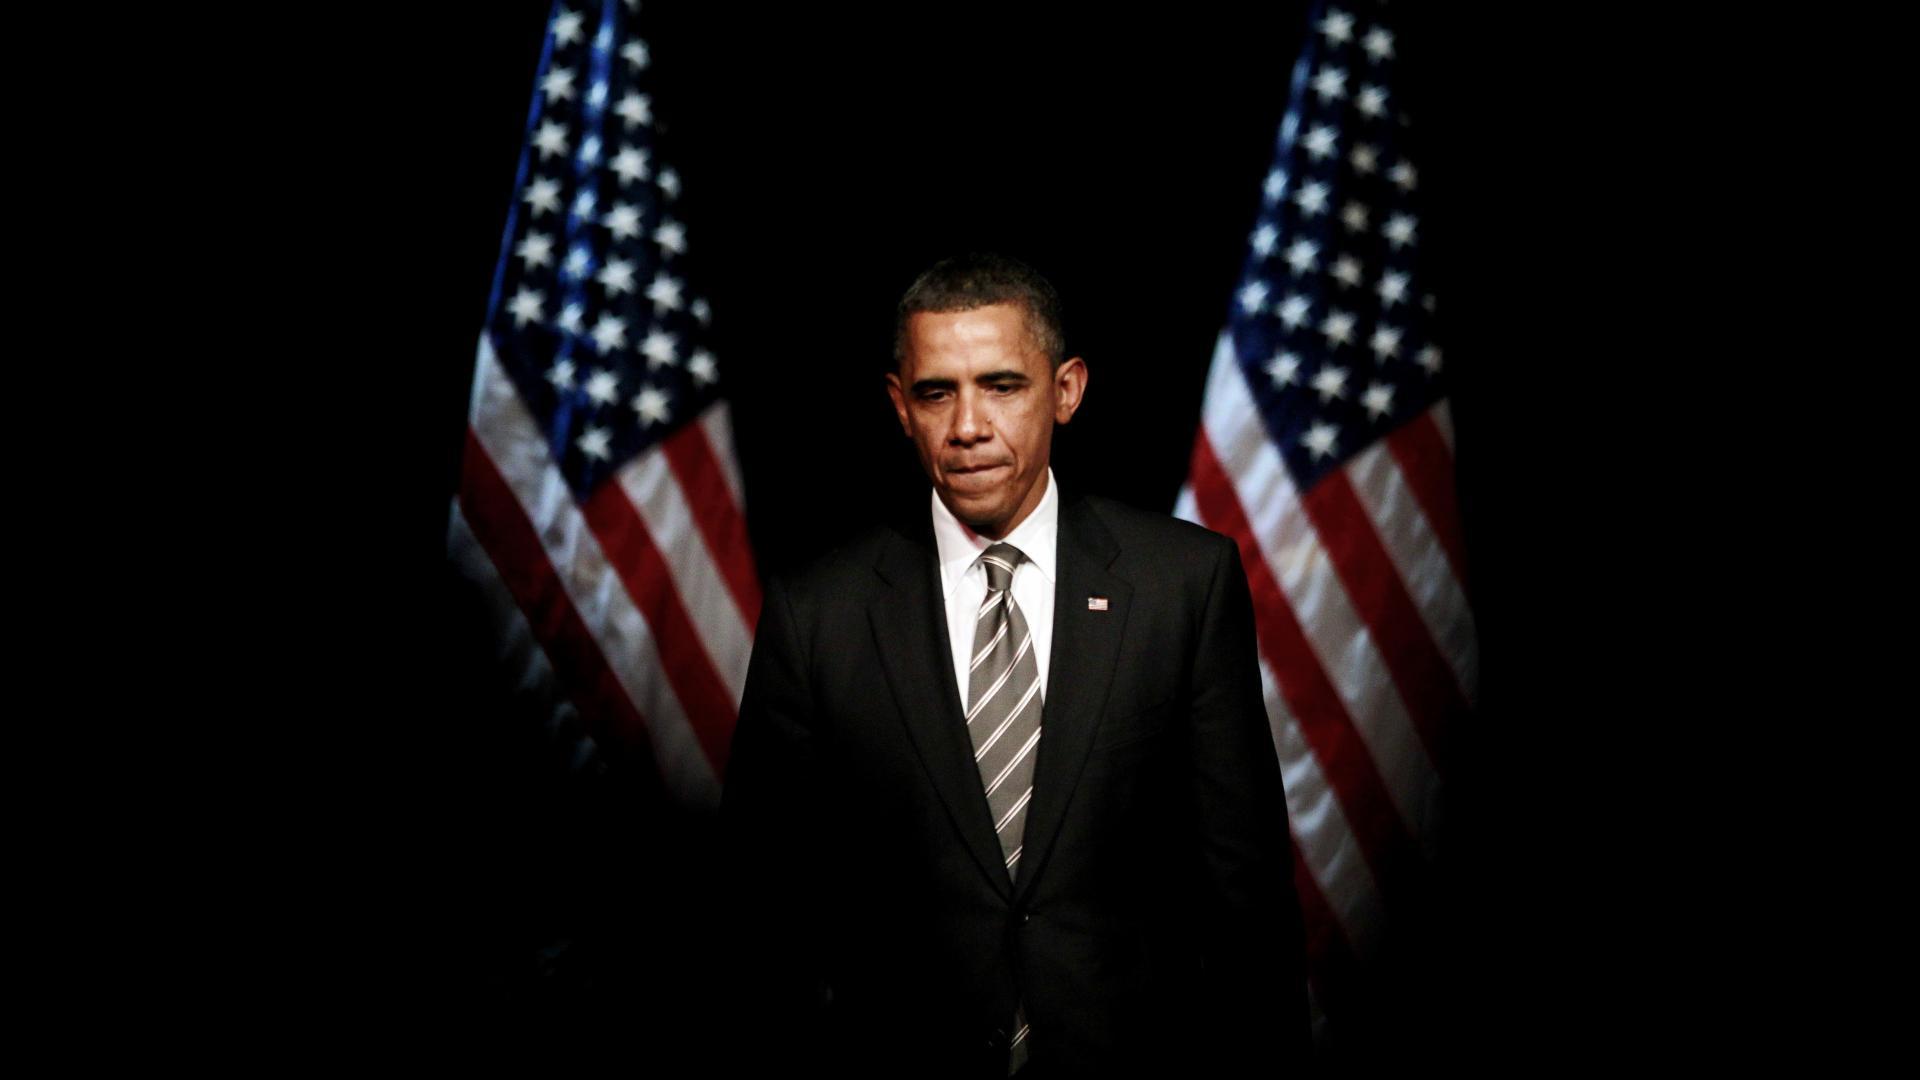 barack obama president desktop wallpaper 59519